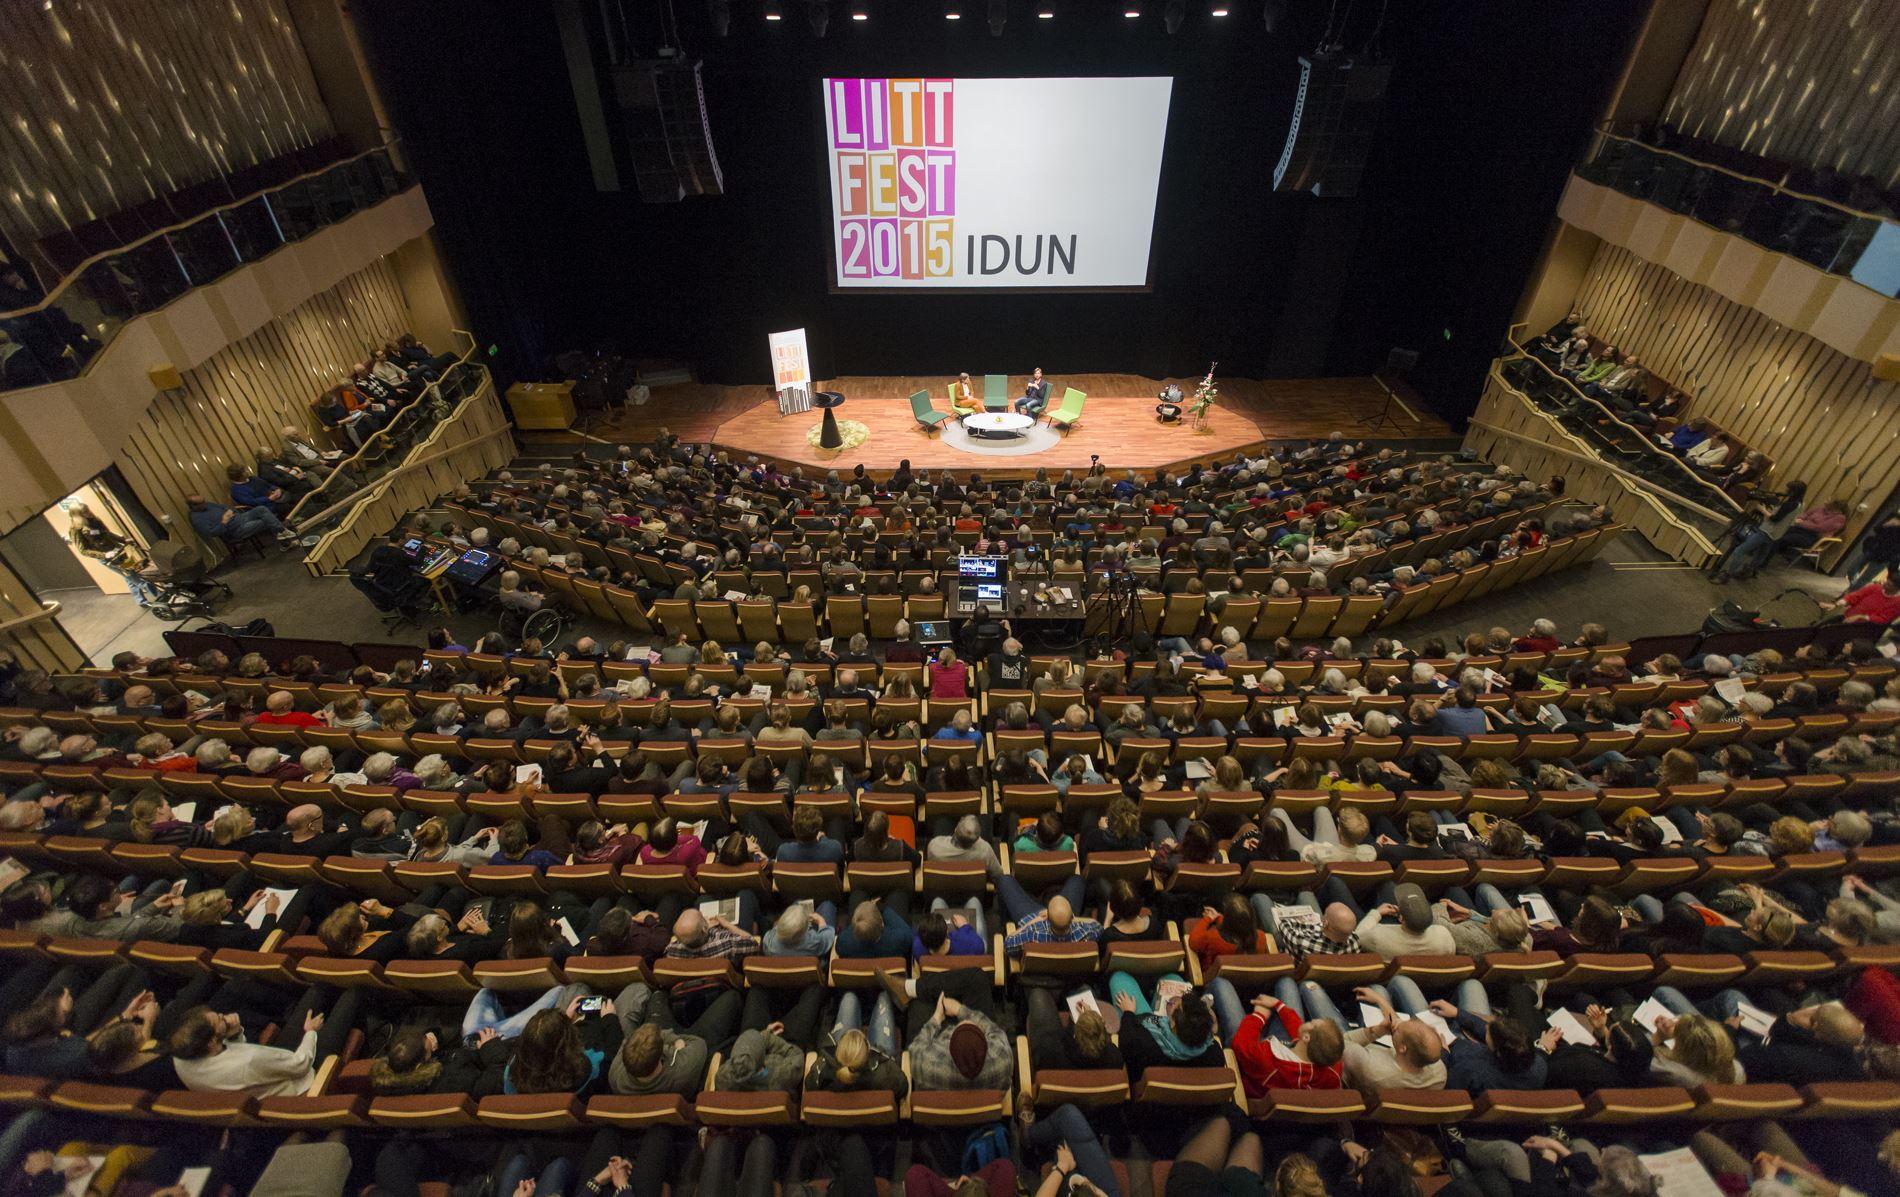 Littfest – Umeå international literature festival